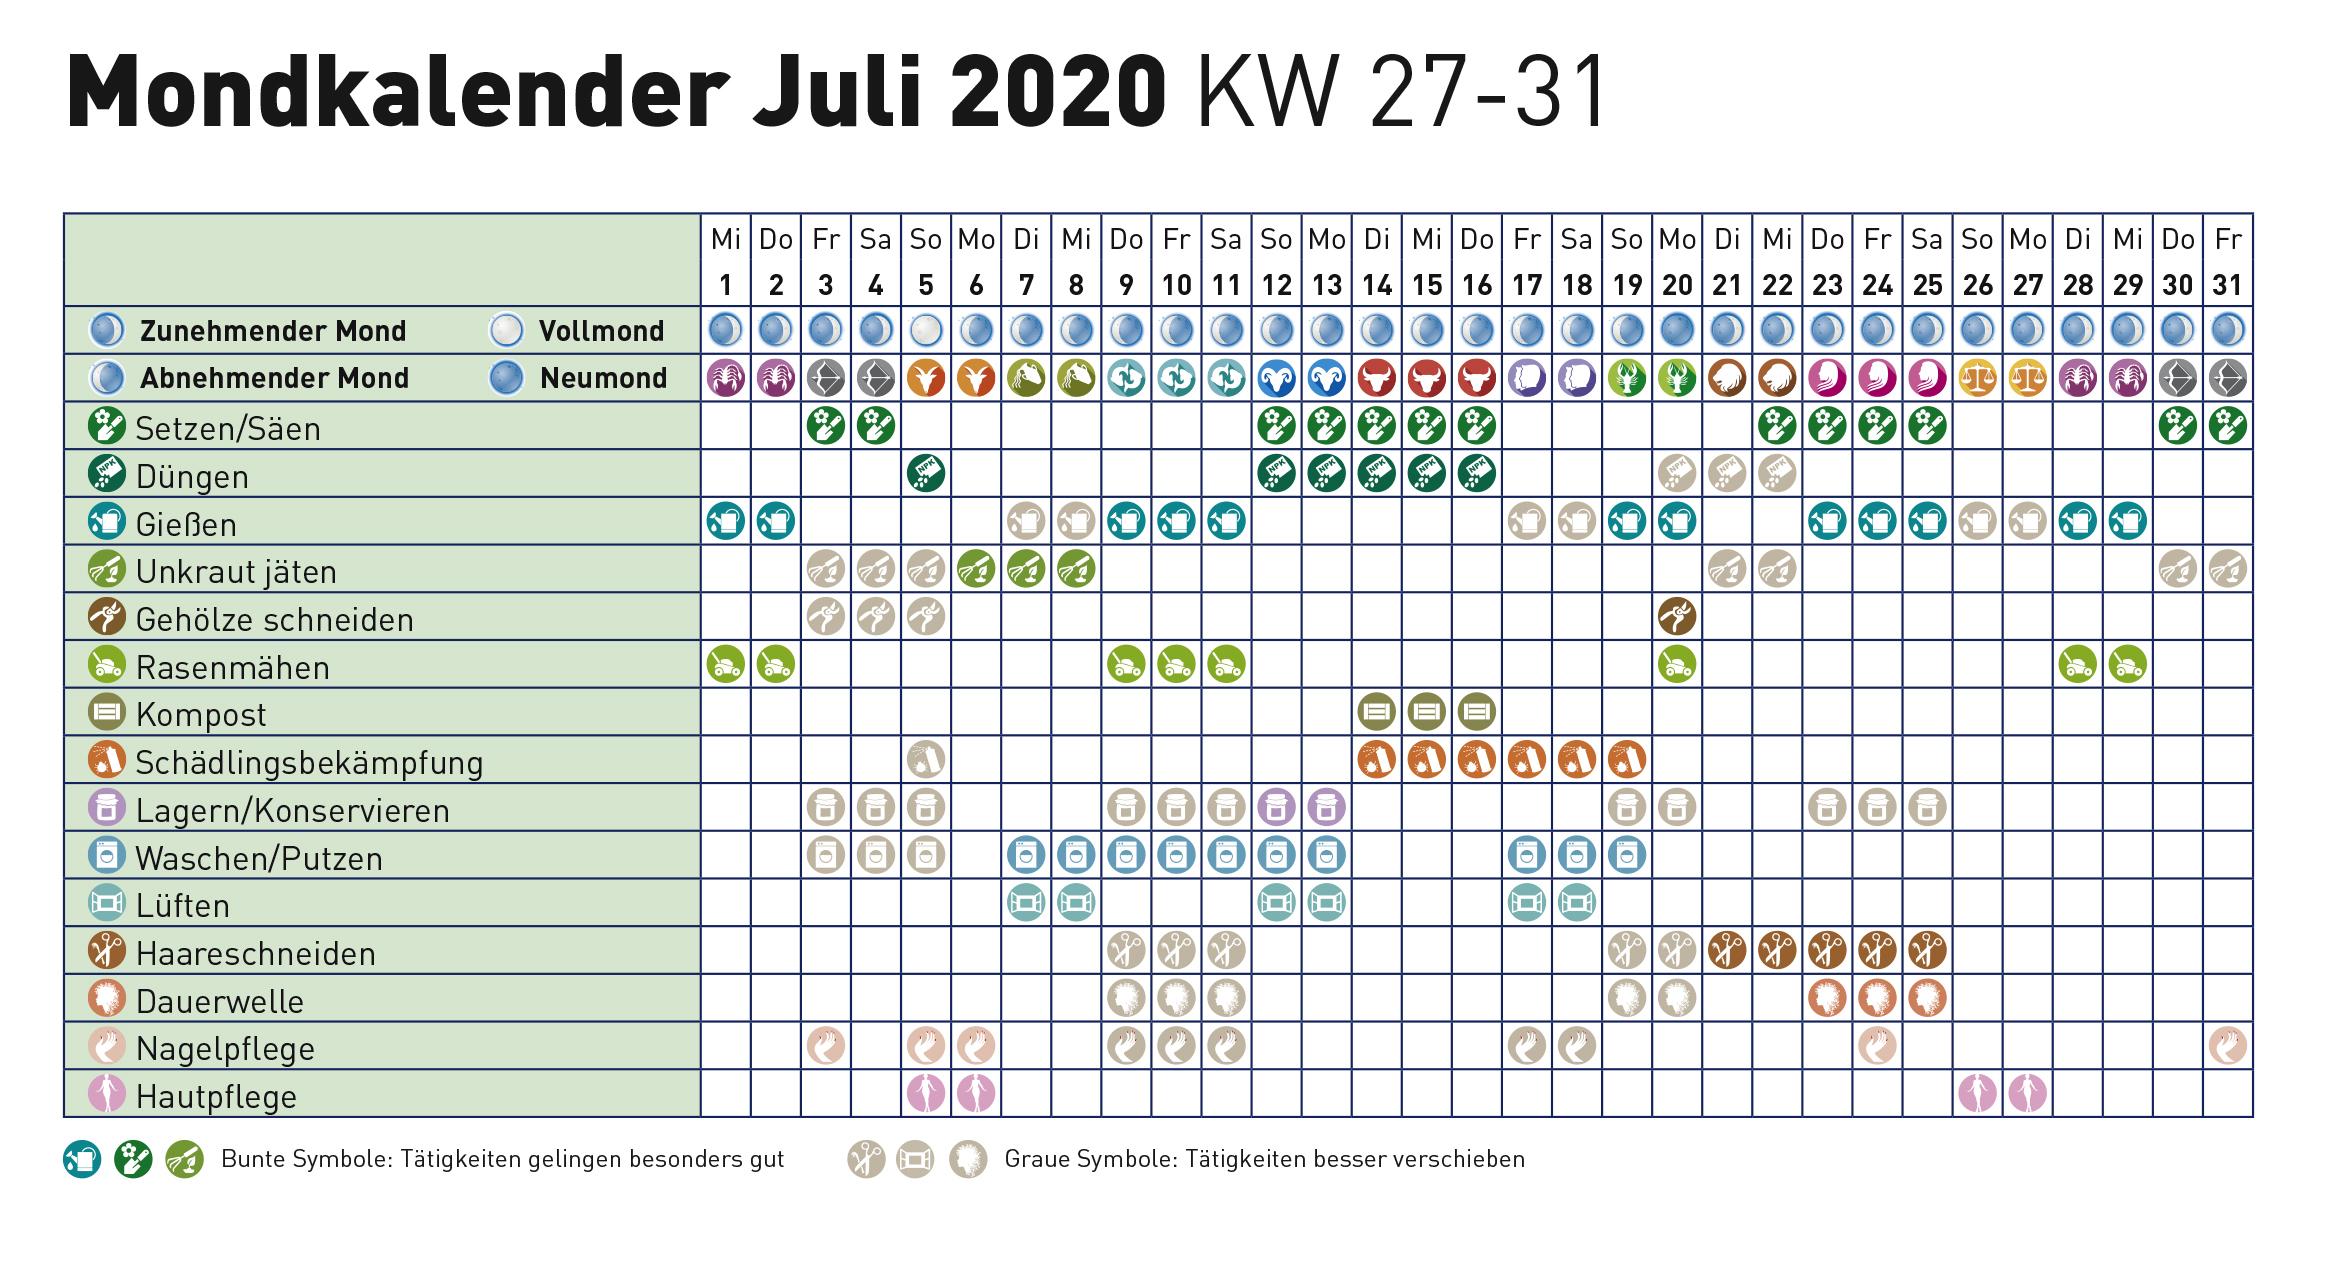 Mondkalender dauerwelle juli